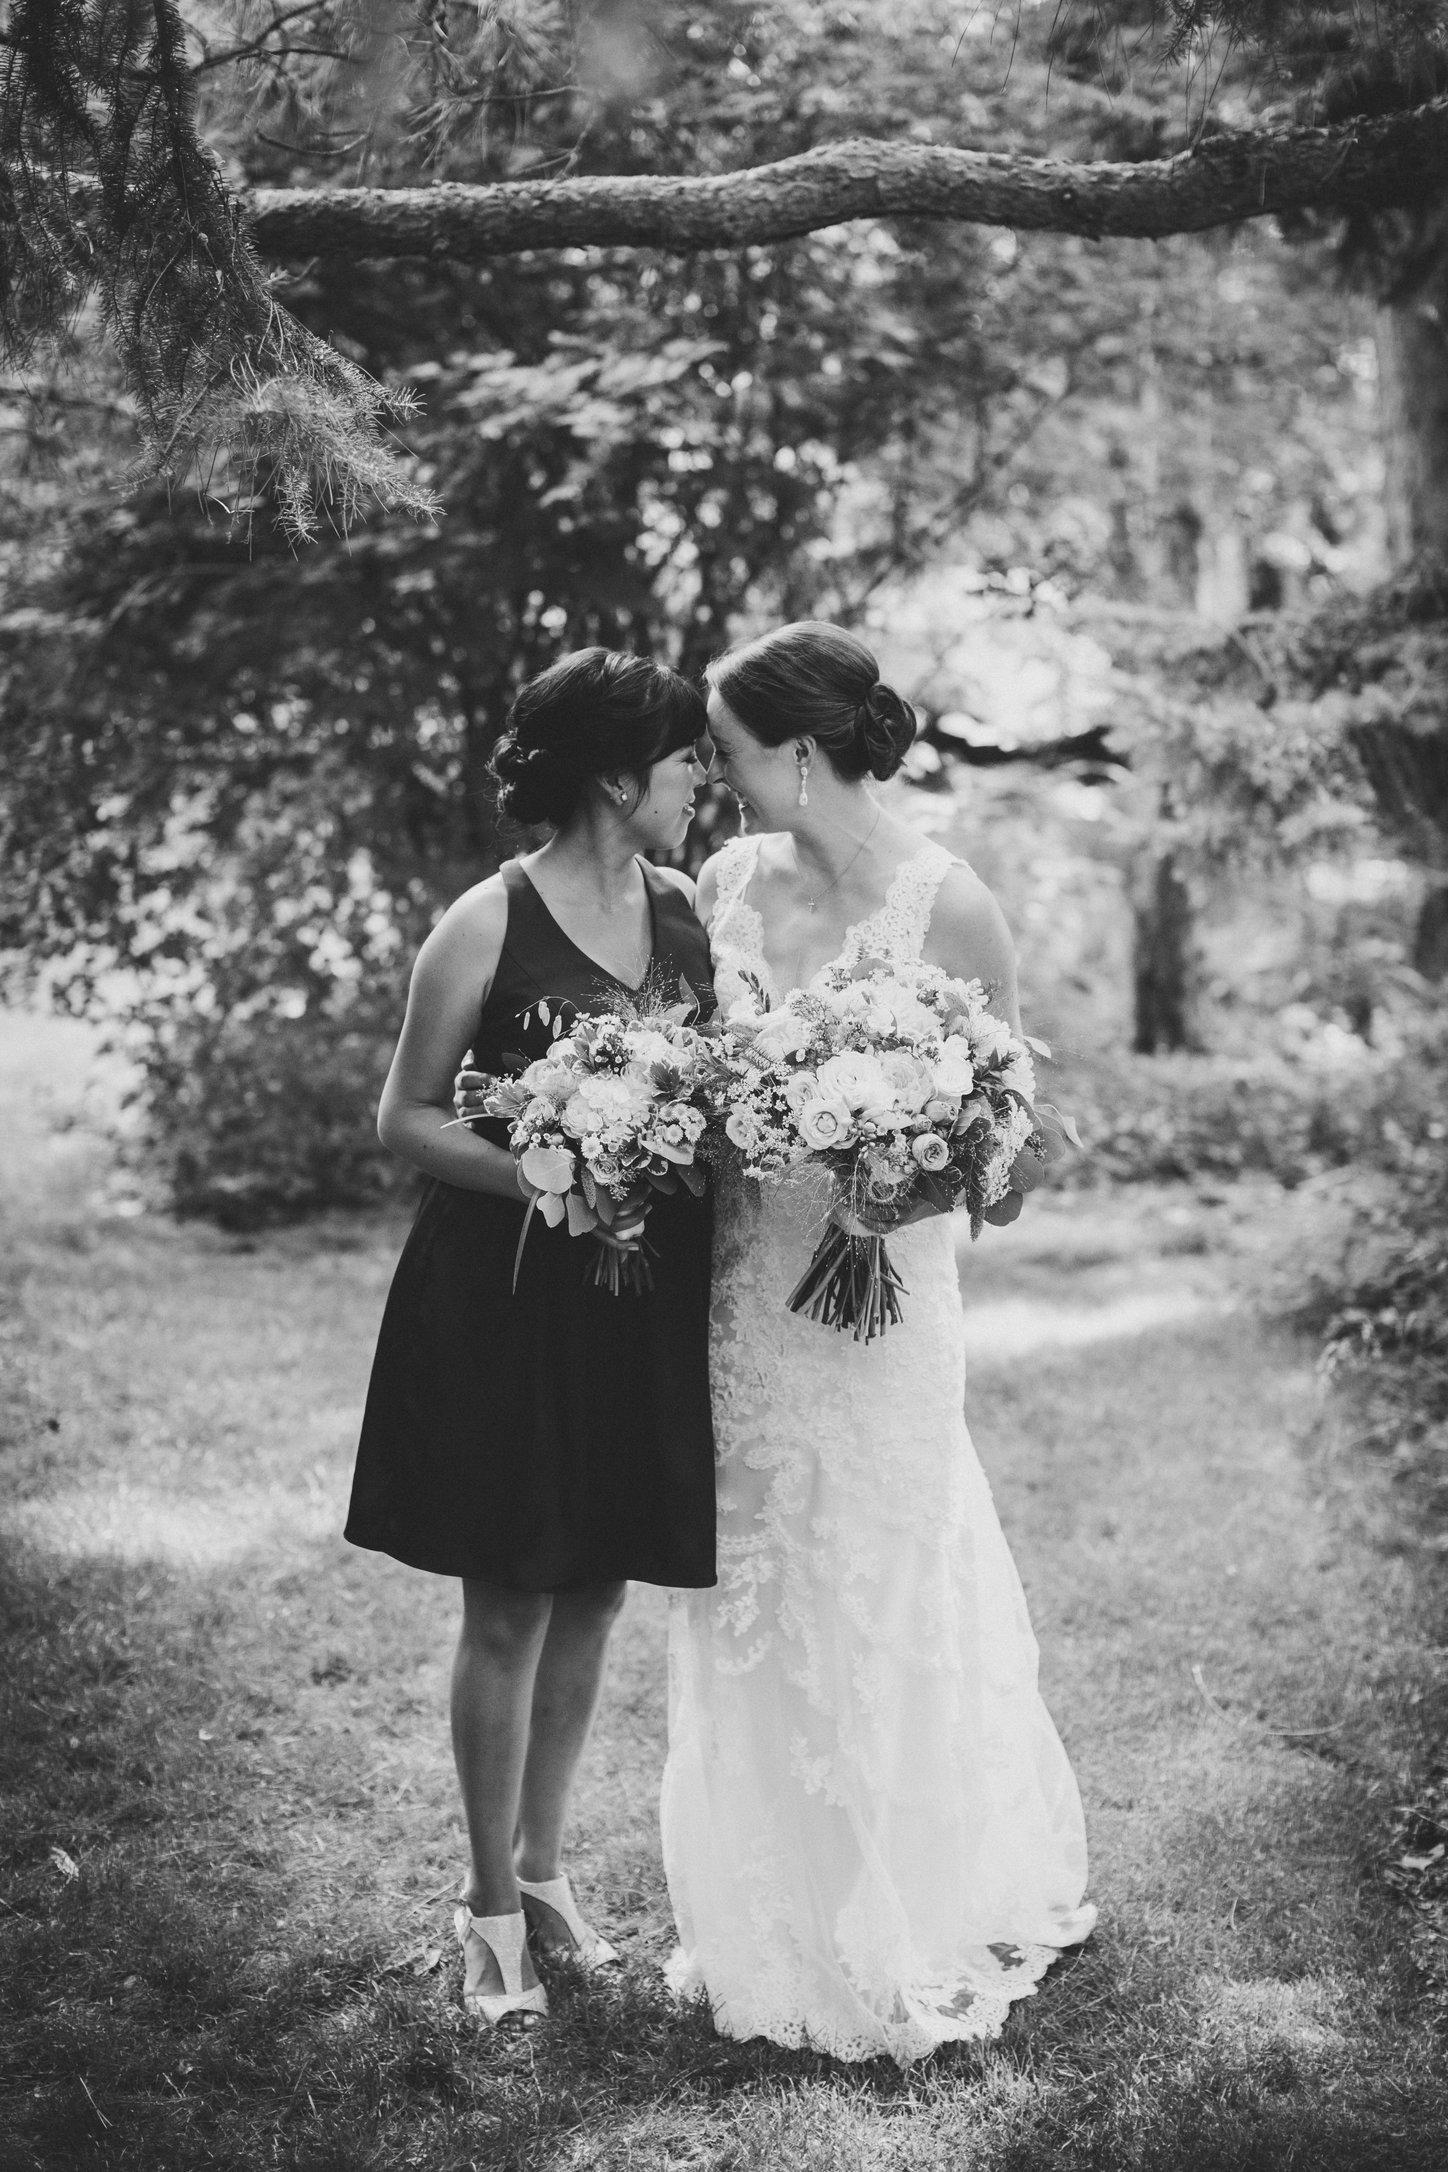 SandC-wedding-363.jpg